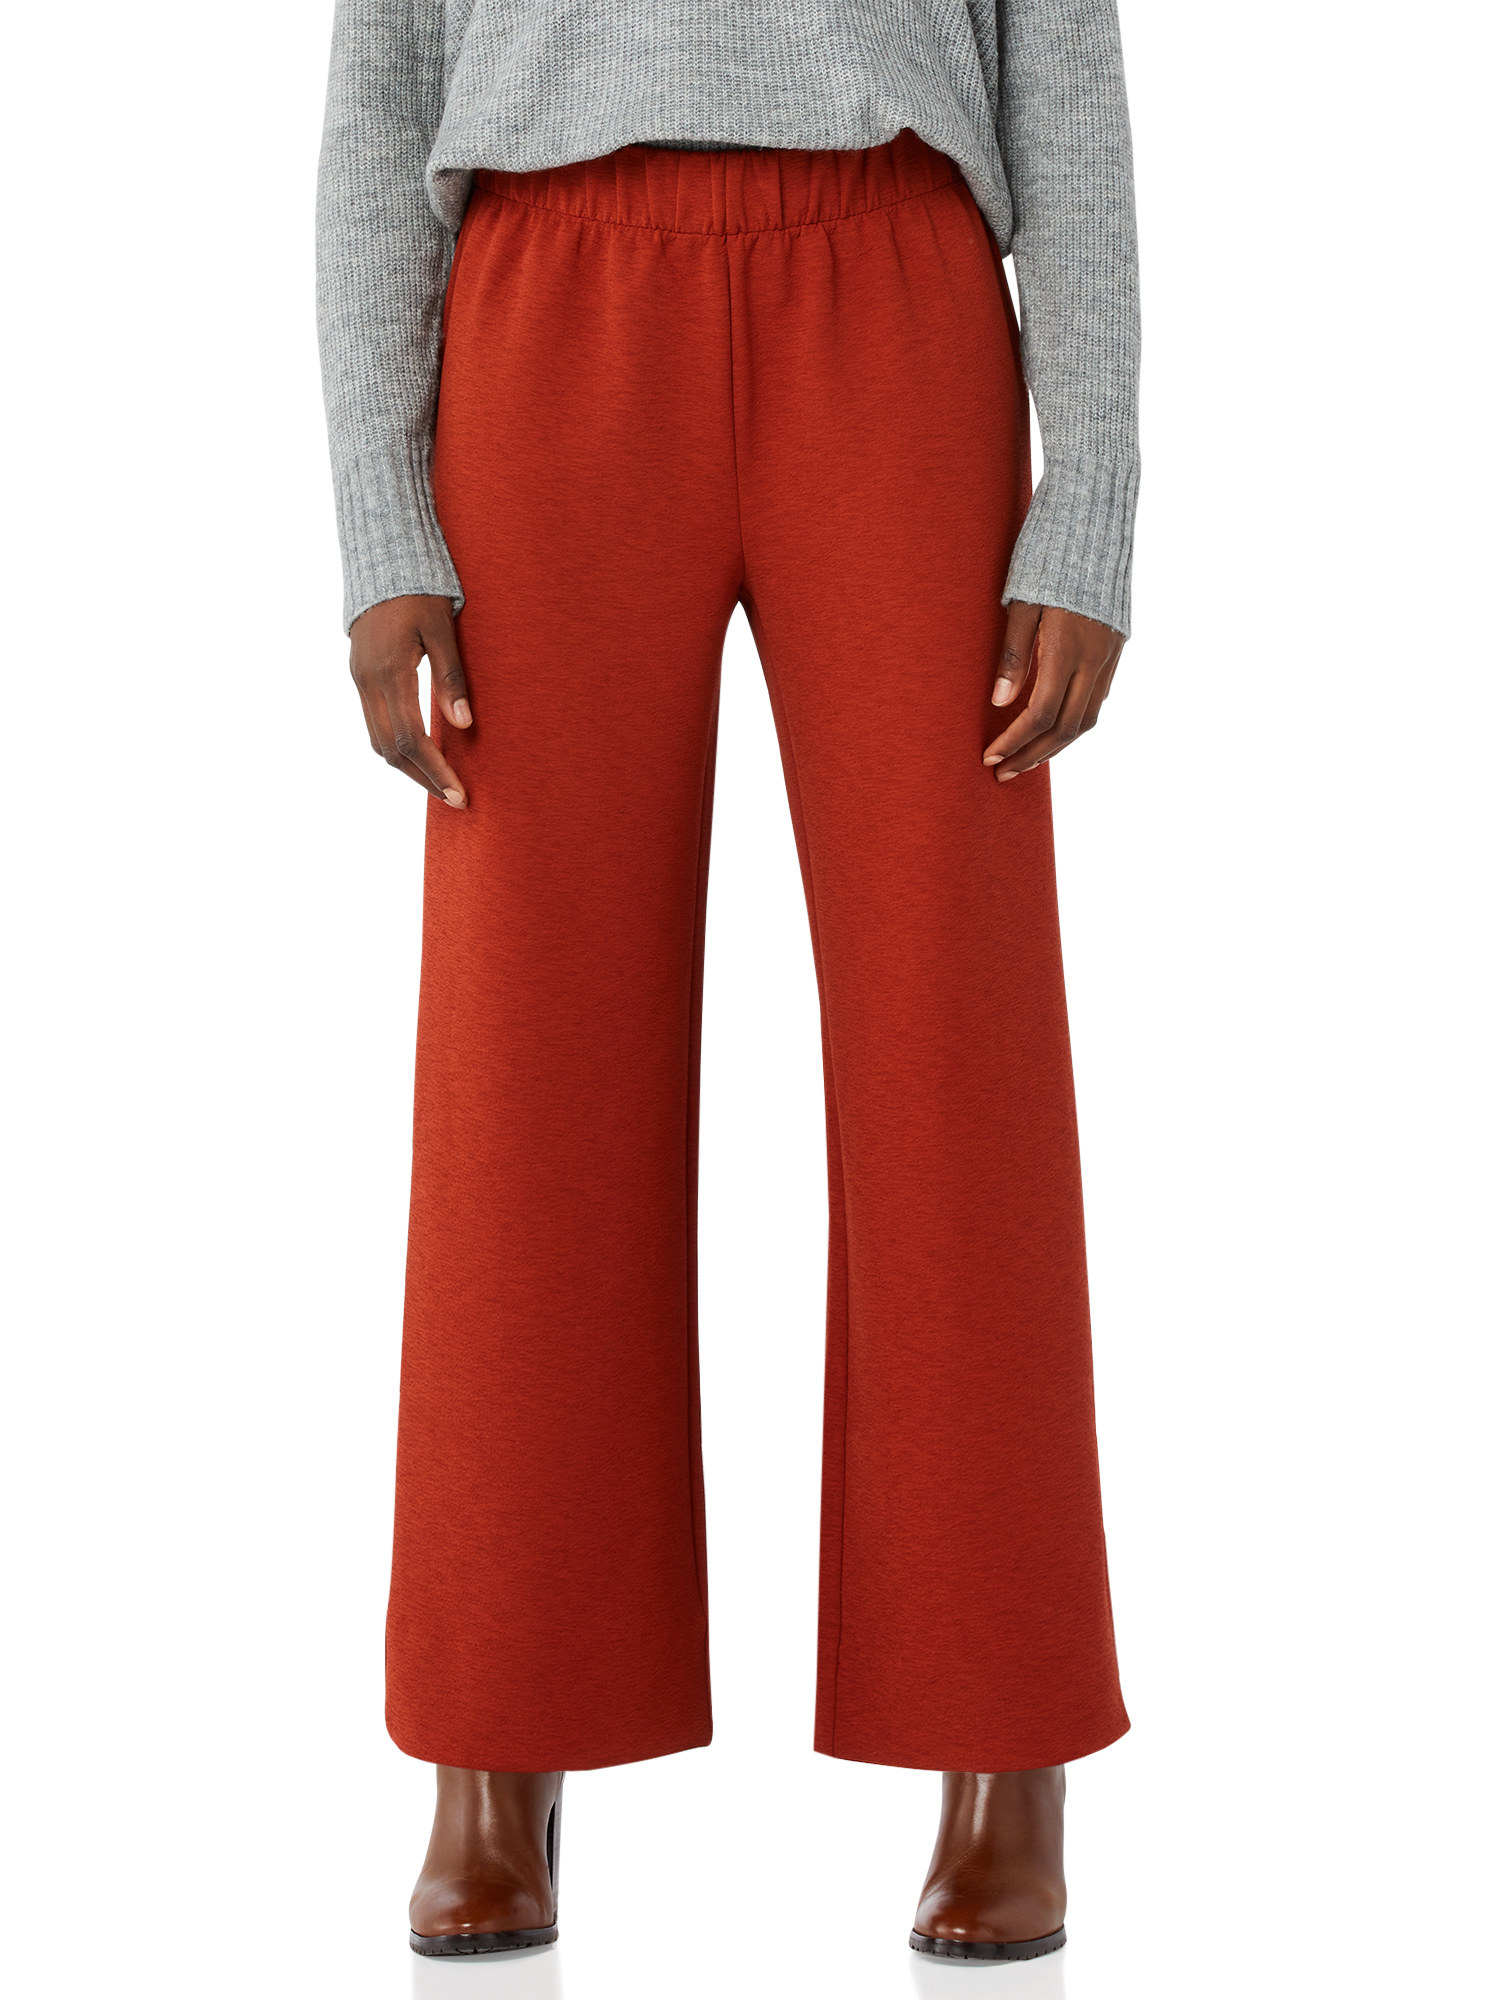 Model wearing orange pants